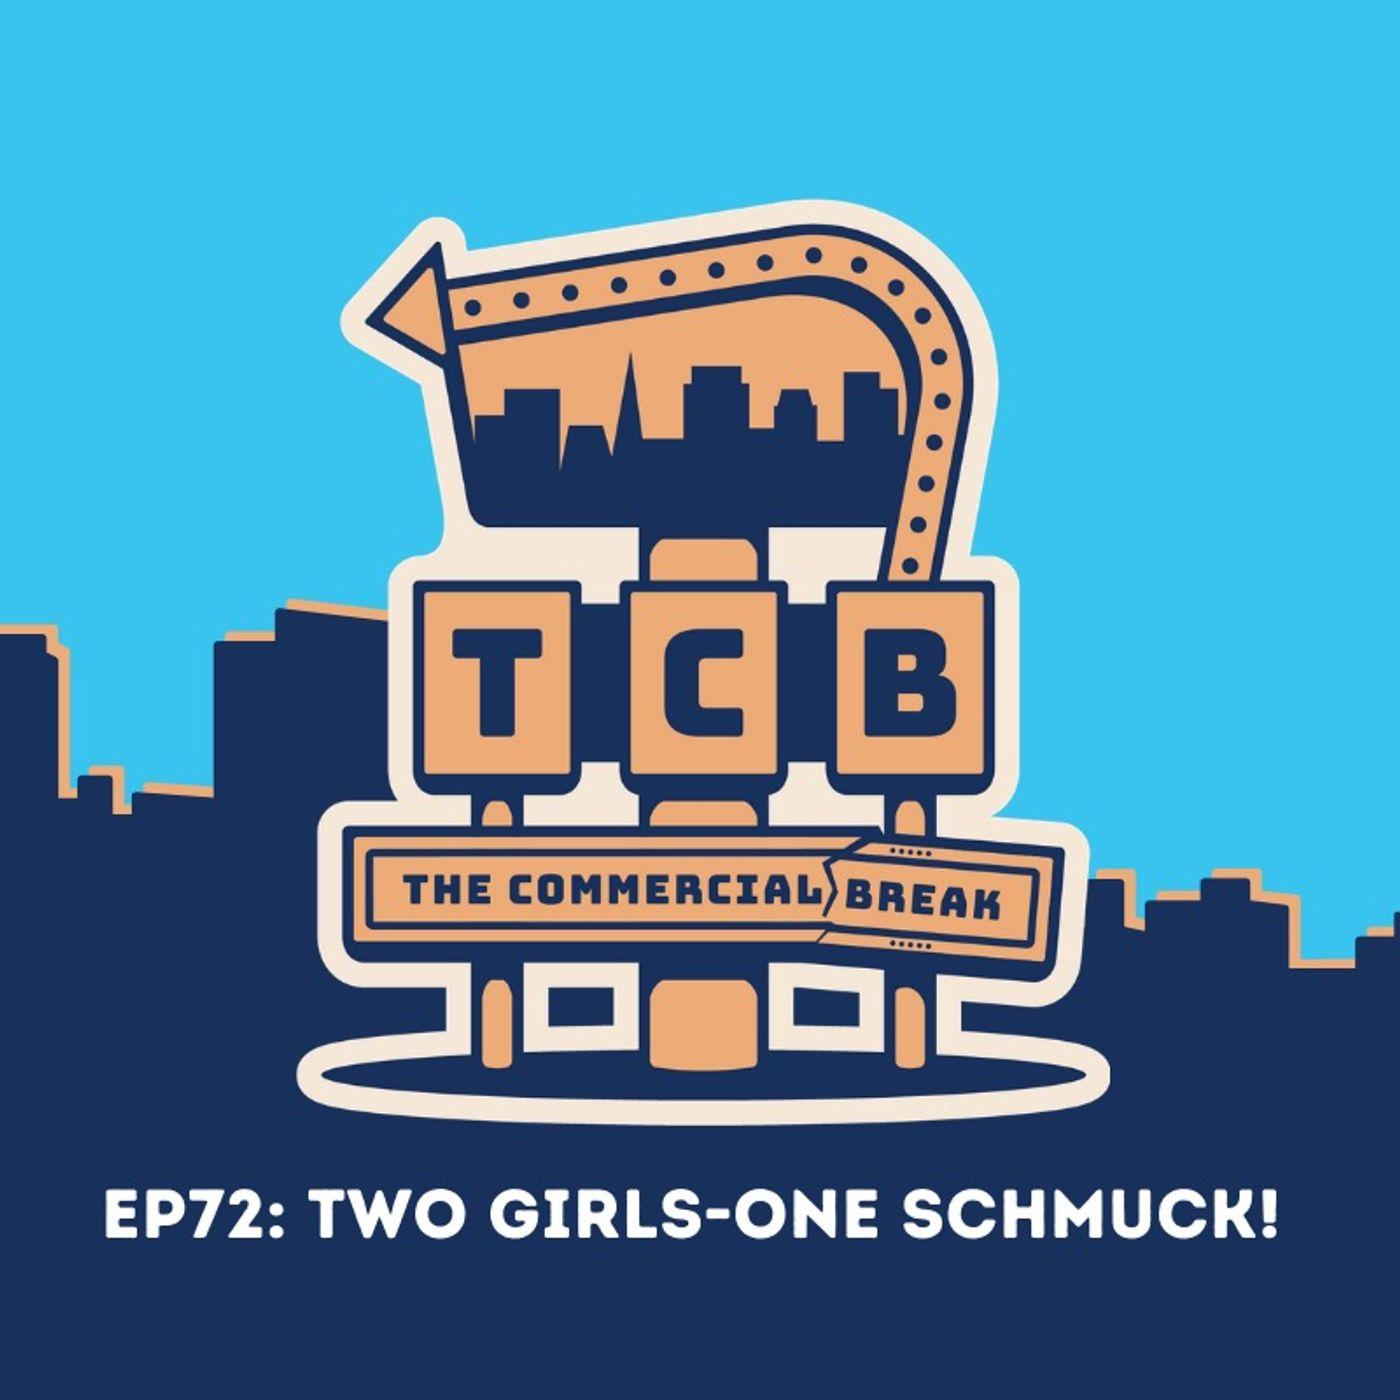 EP72: Two Girls - One Schmuck!